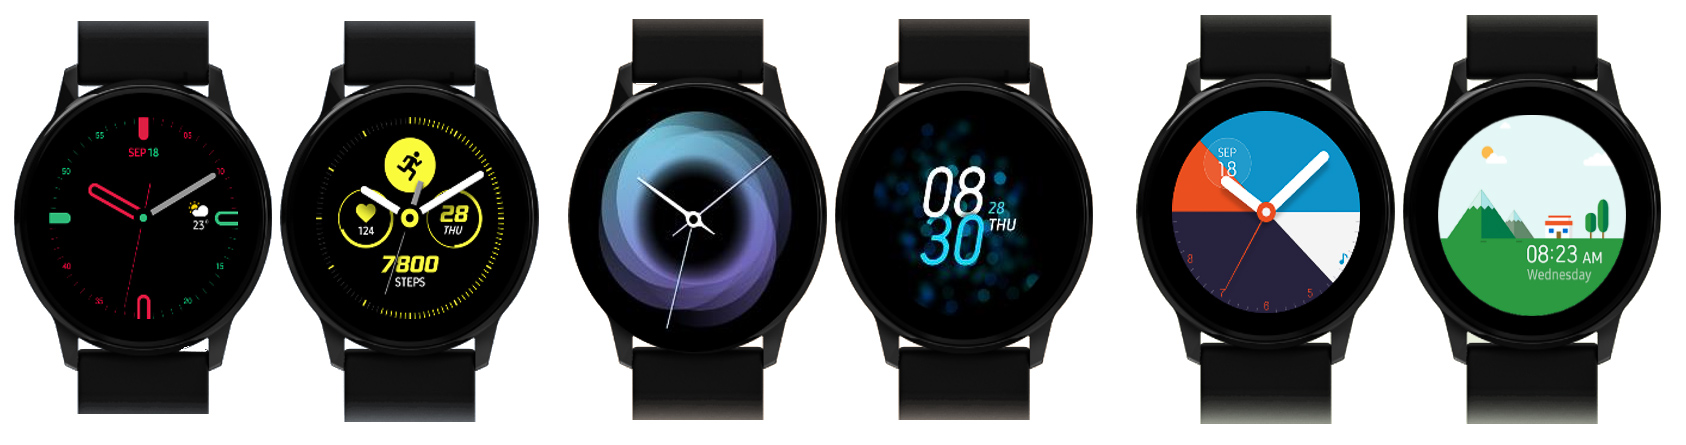 fc48f383dd6 Samsung Galaxy Watch Active specs leak  AMOLED display and no ...